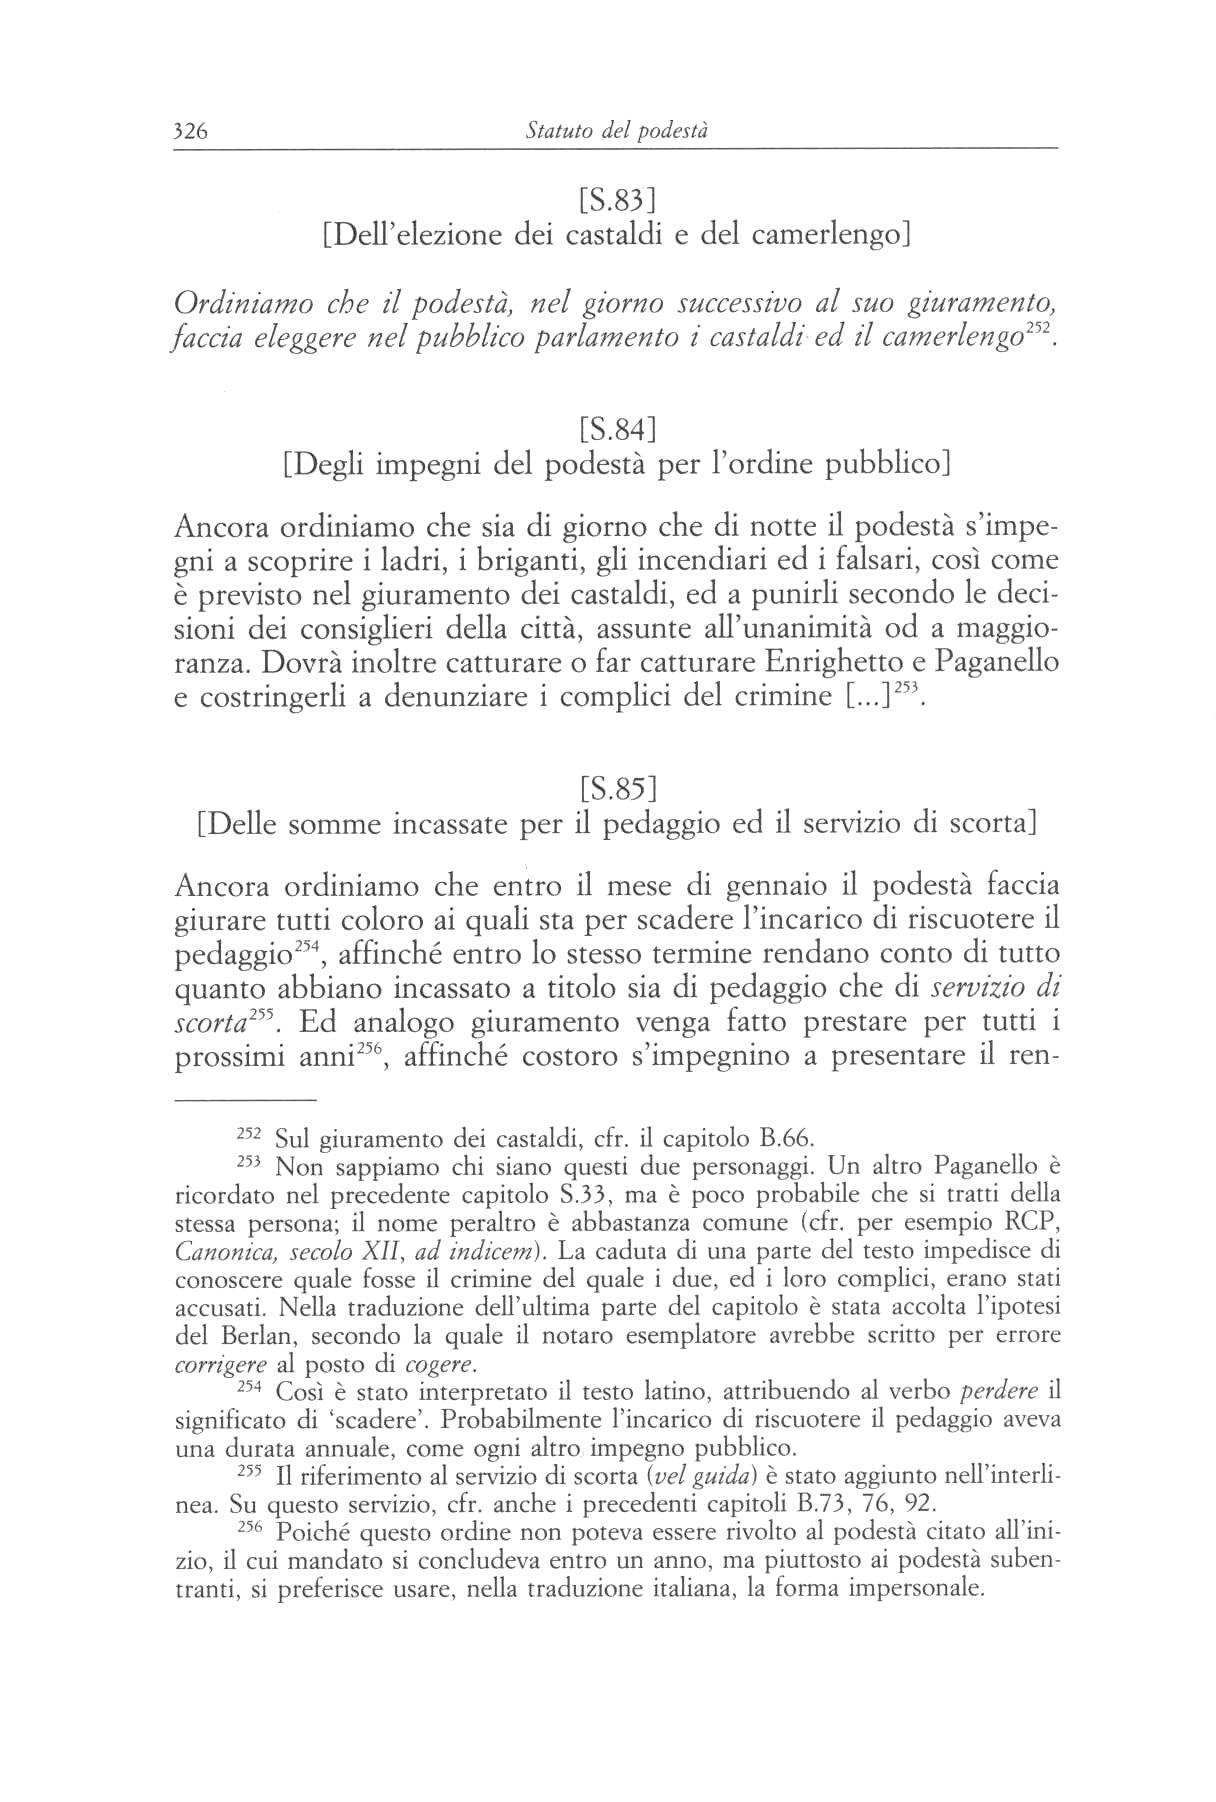 statuti pistoiesi del sec.XII 0326.jpg